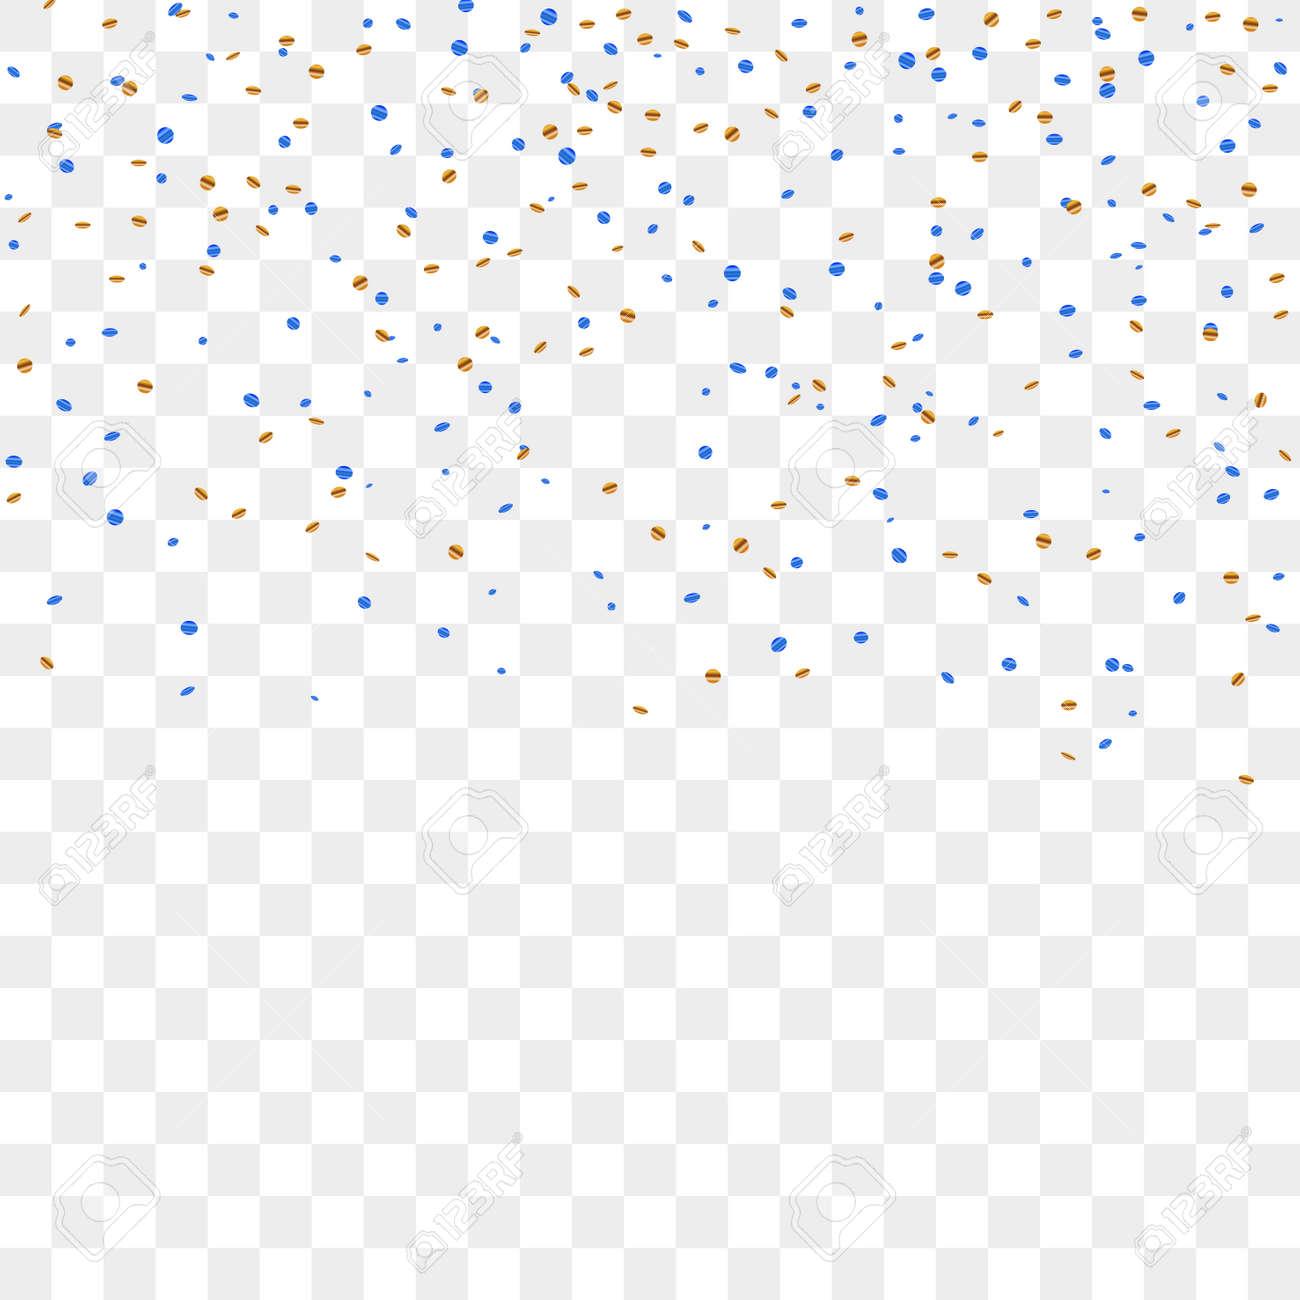 Gouden Blauwe Confetti Viering Geisoleerd Op Transparante